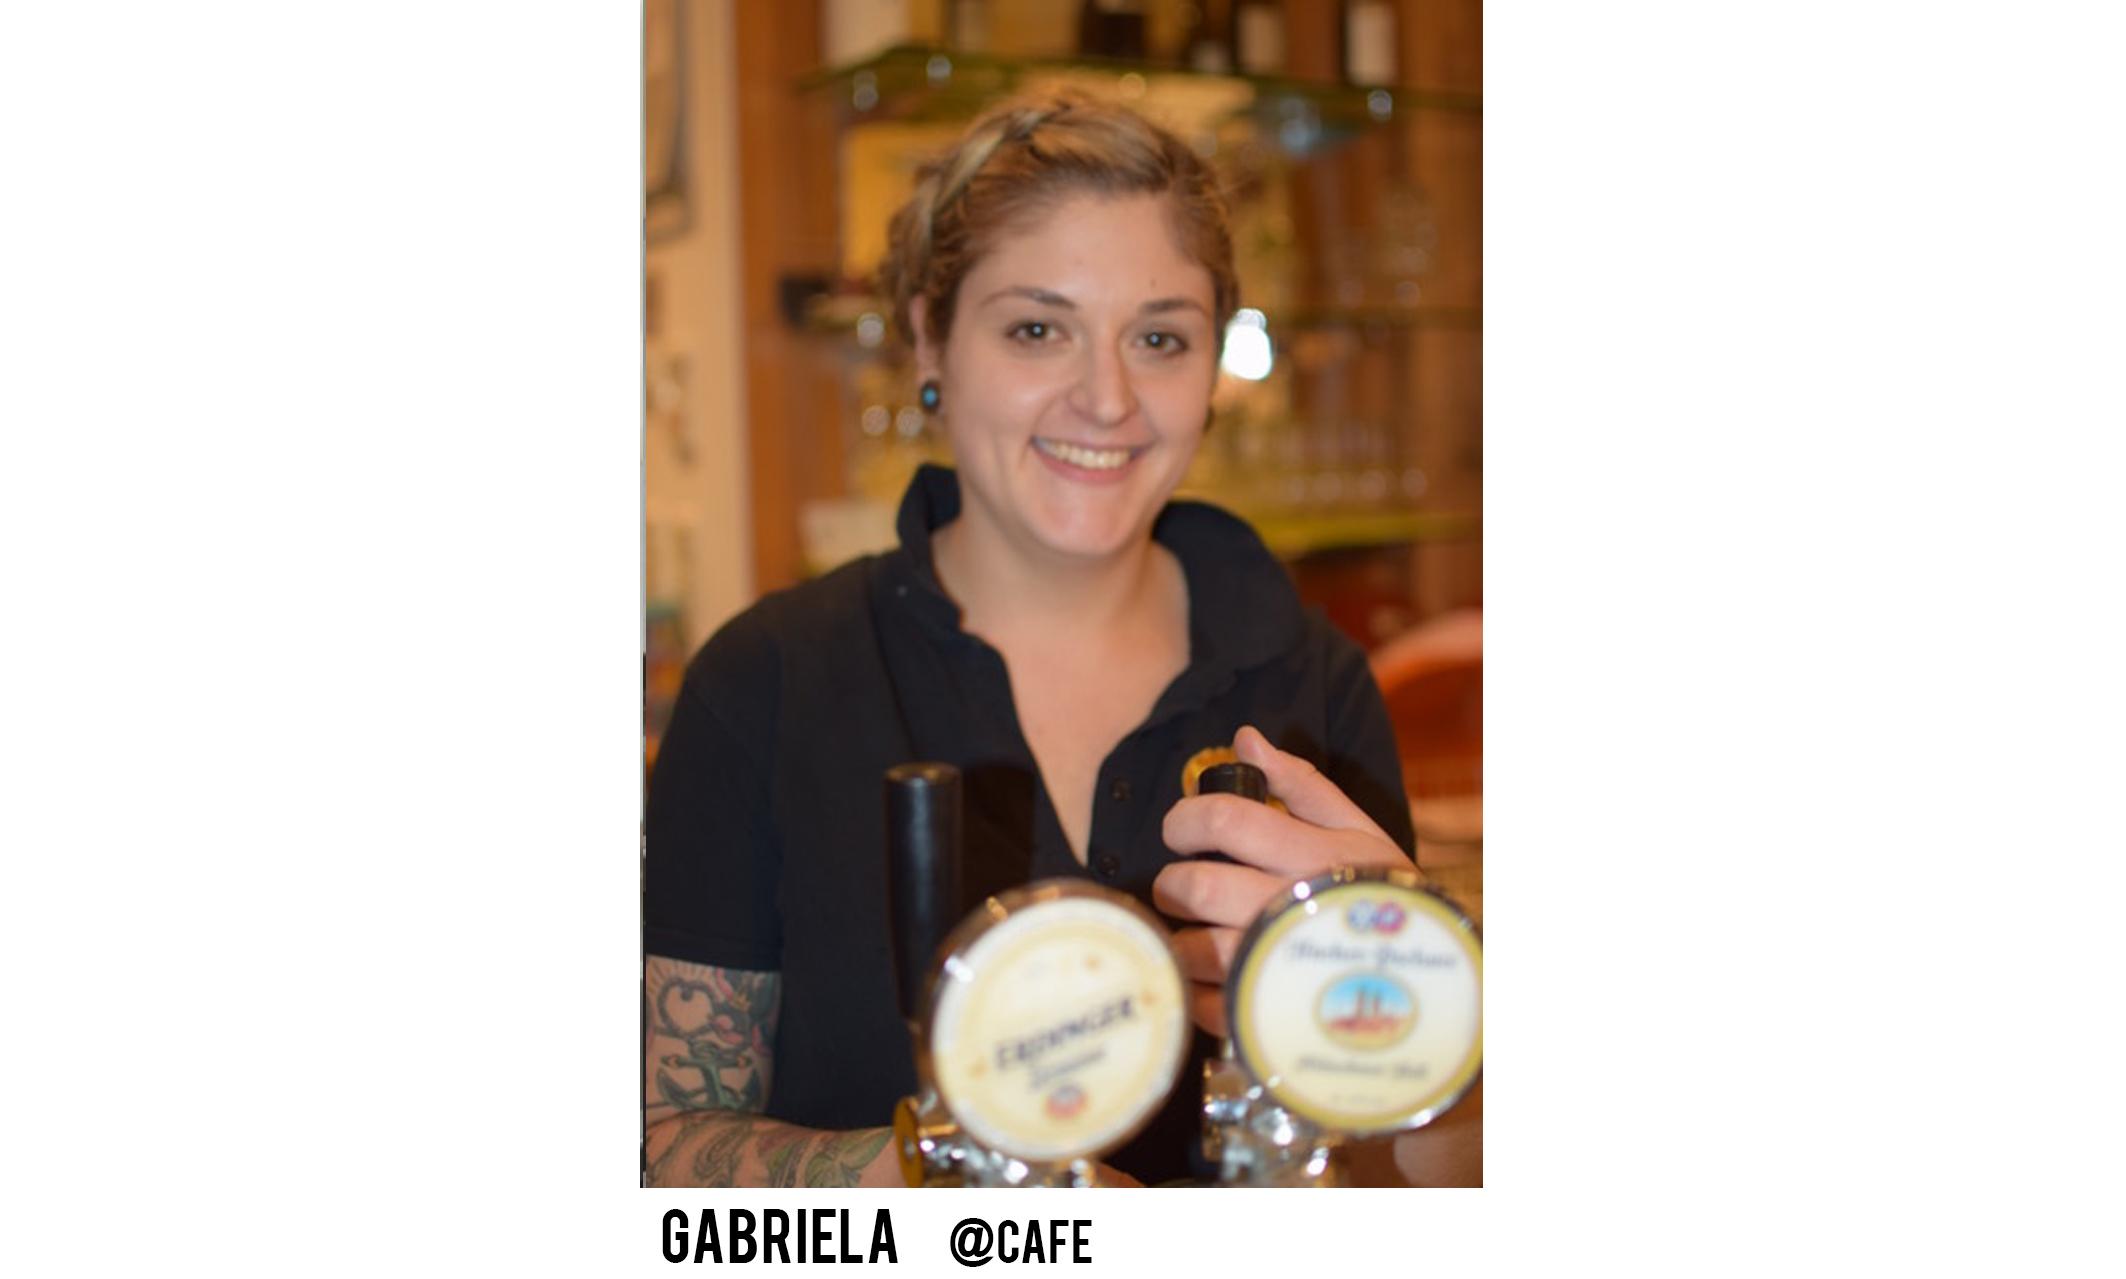 gabriela_cafe